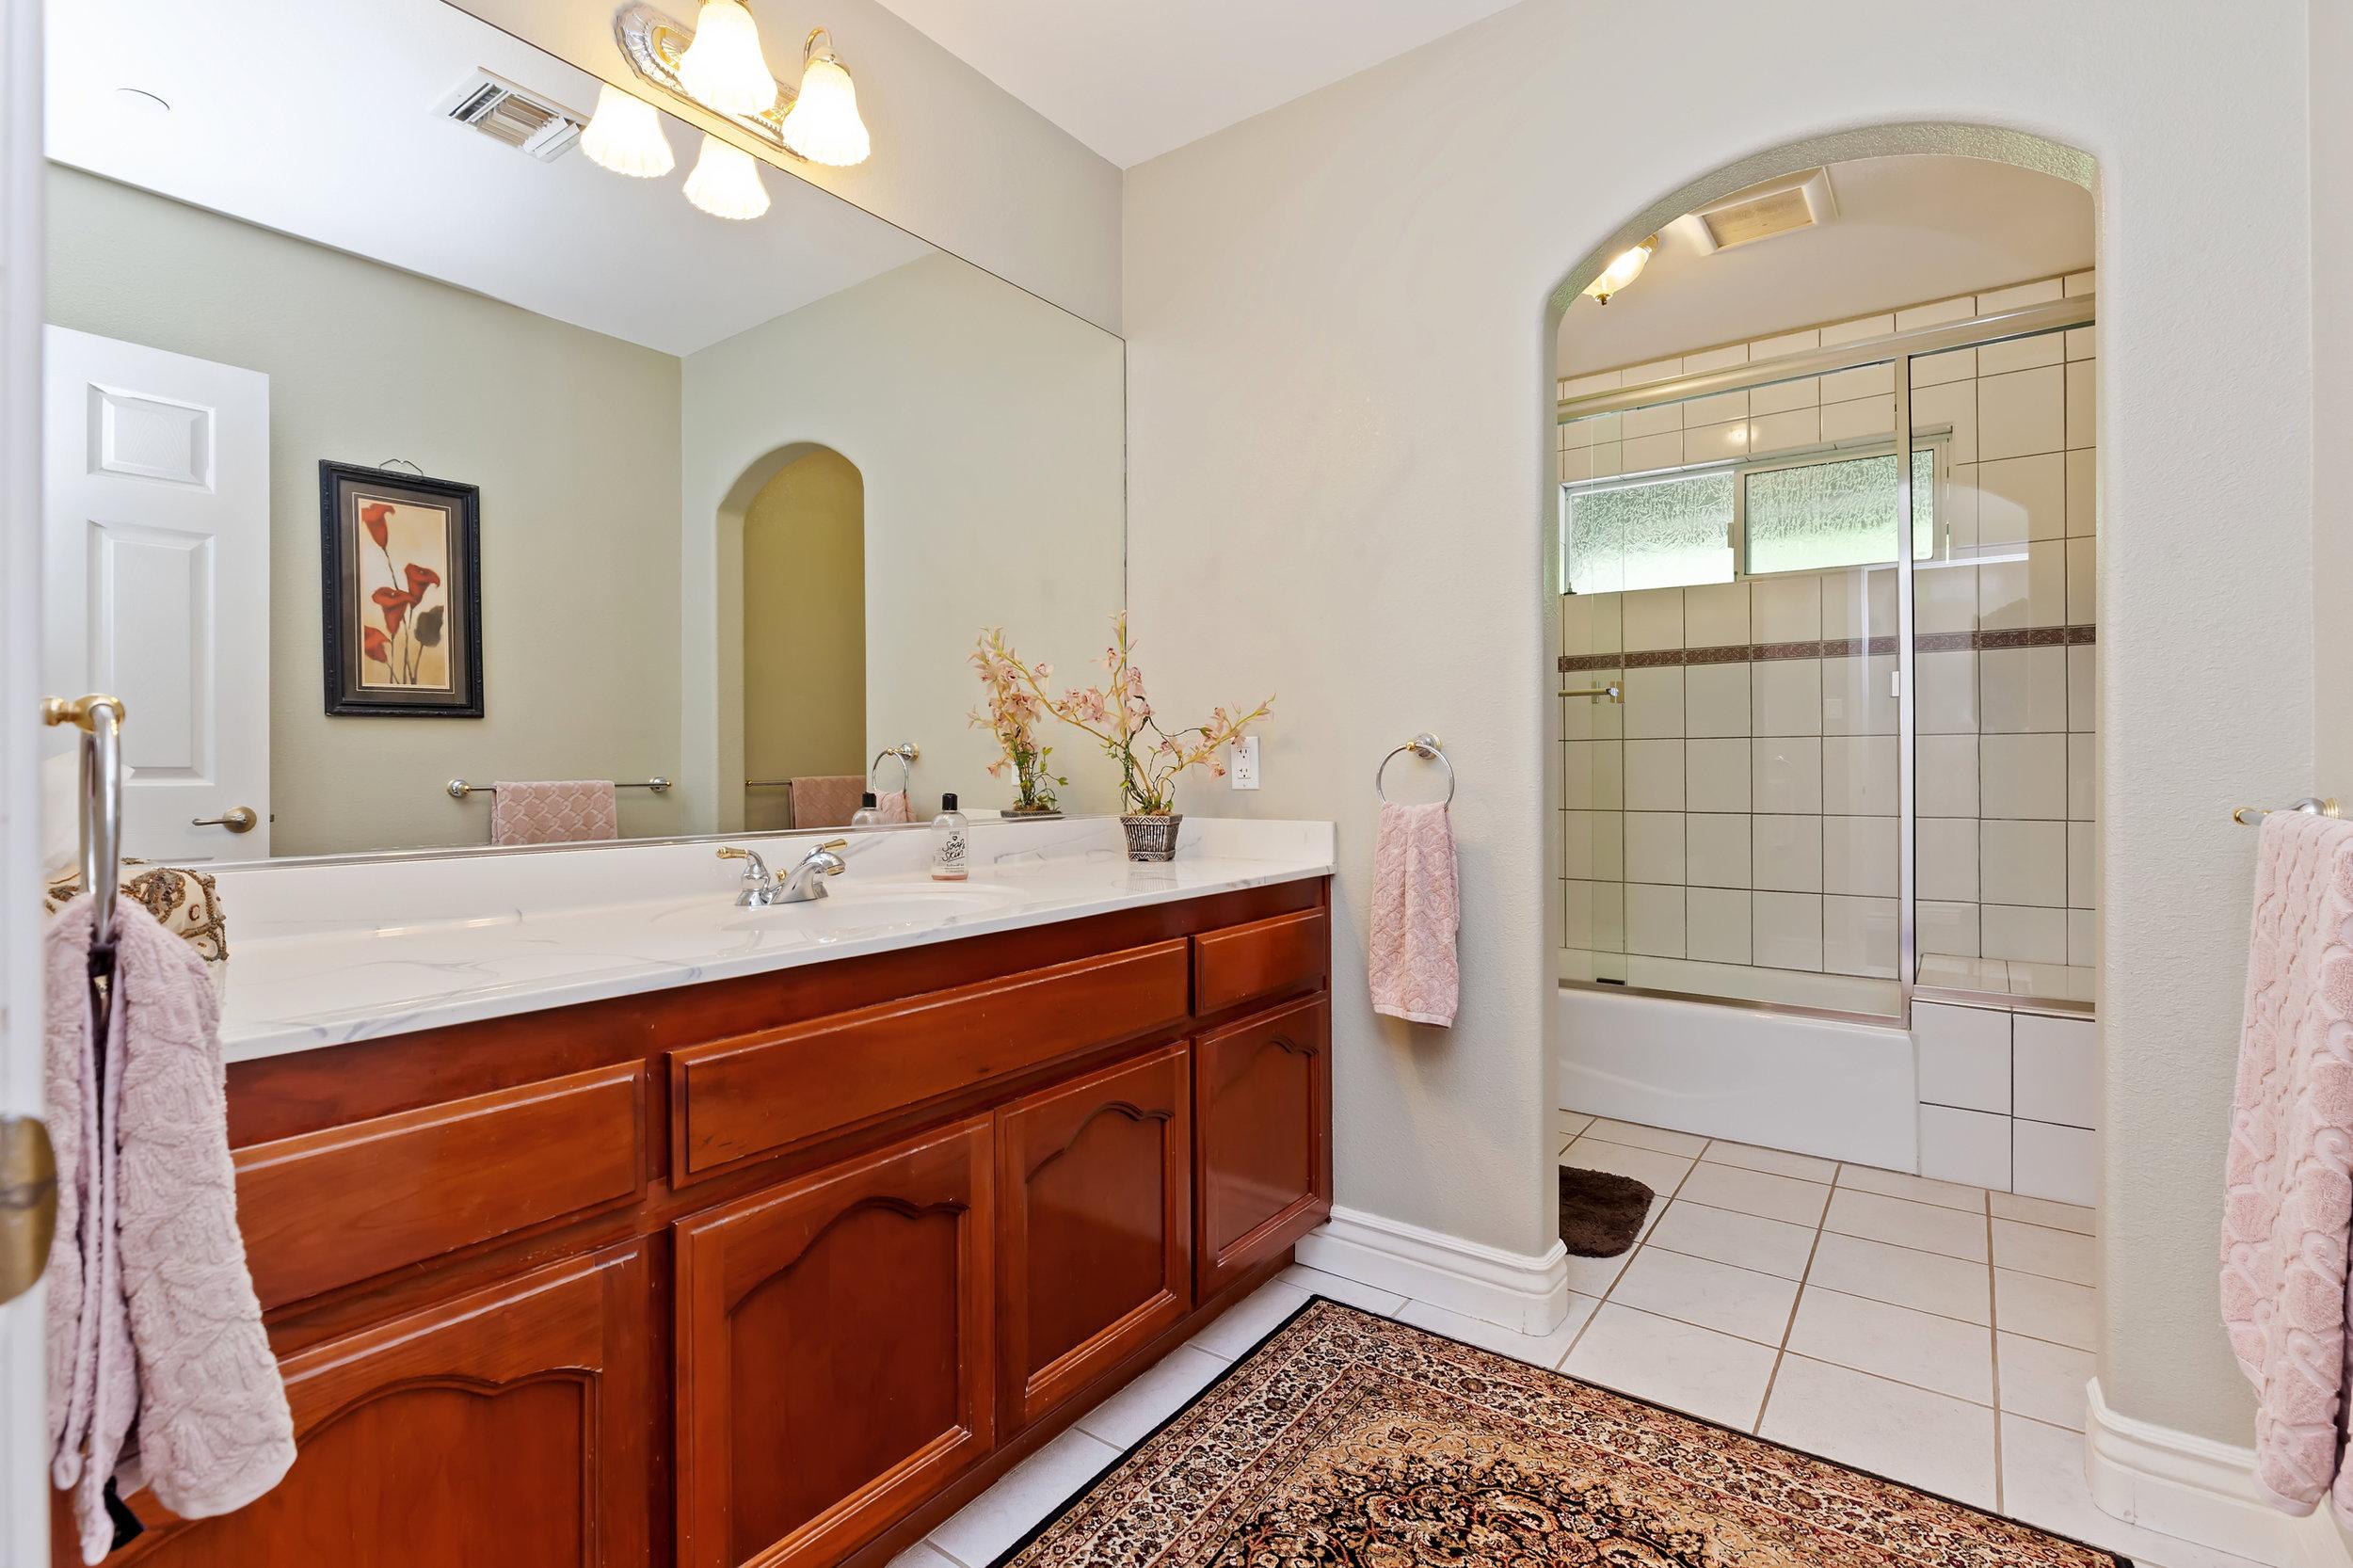 040_Bathroom.jpg